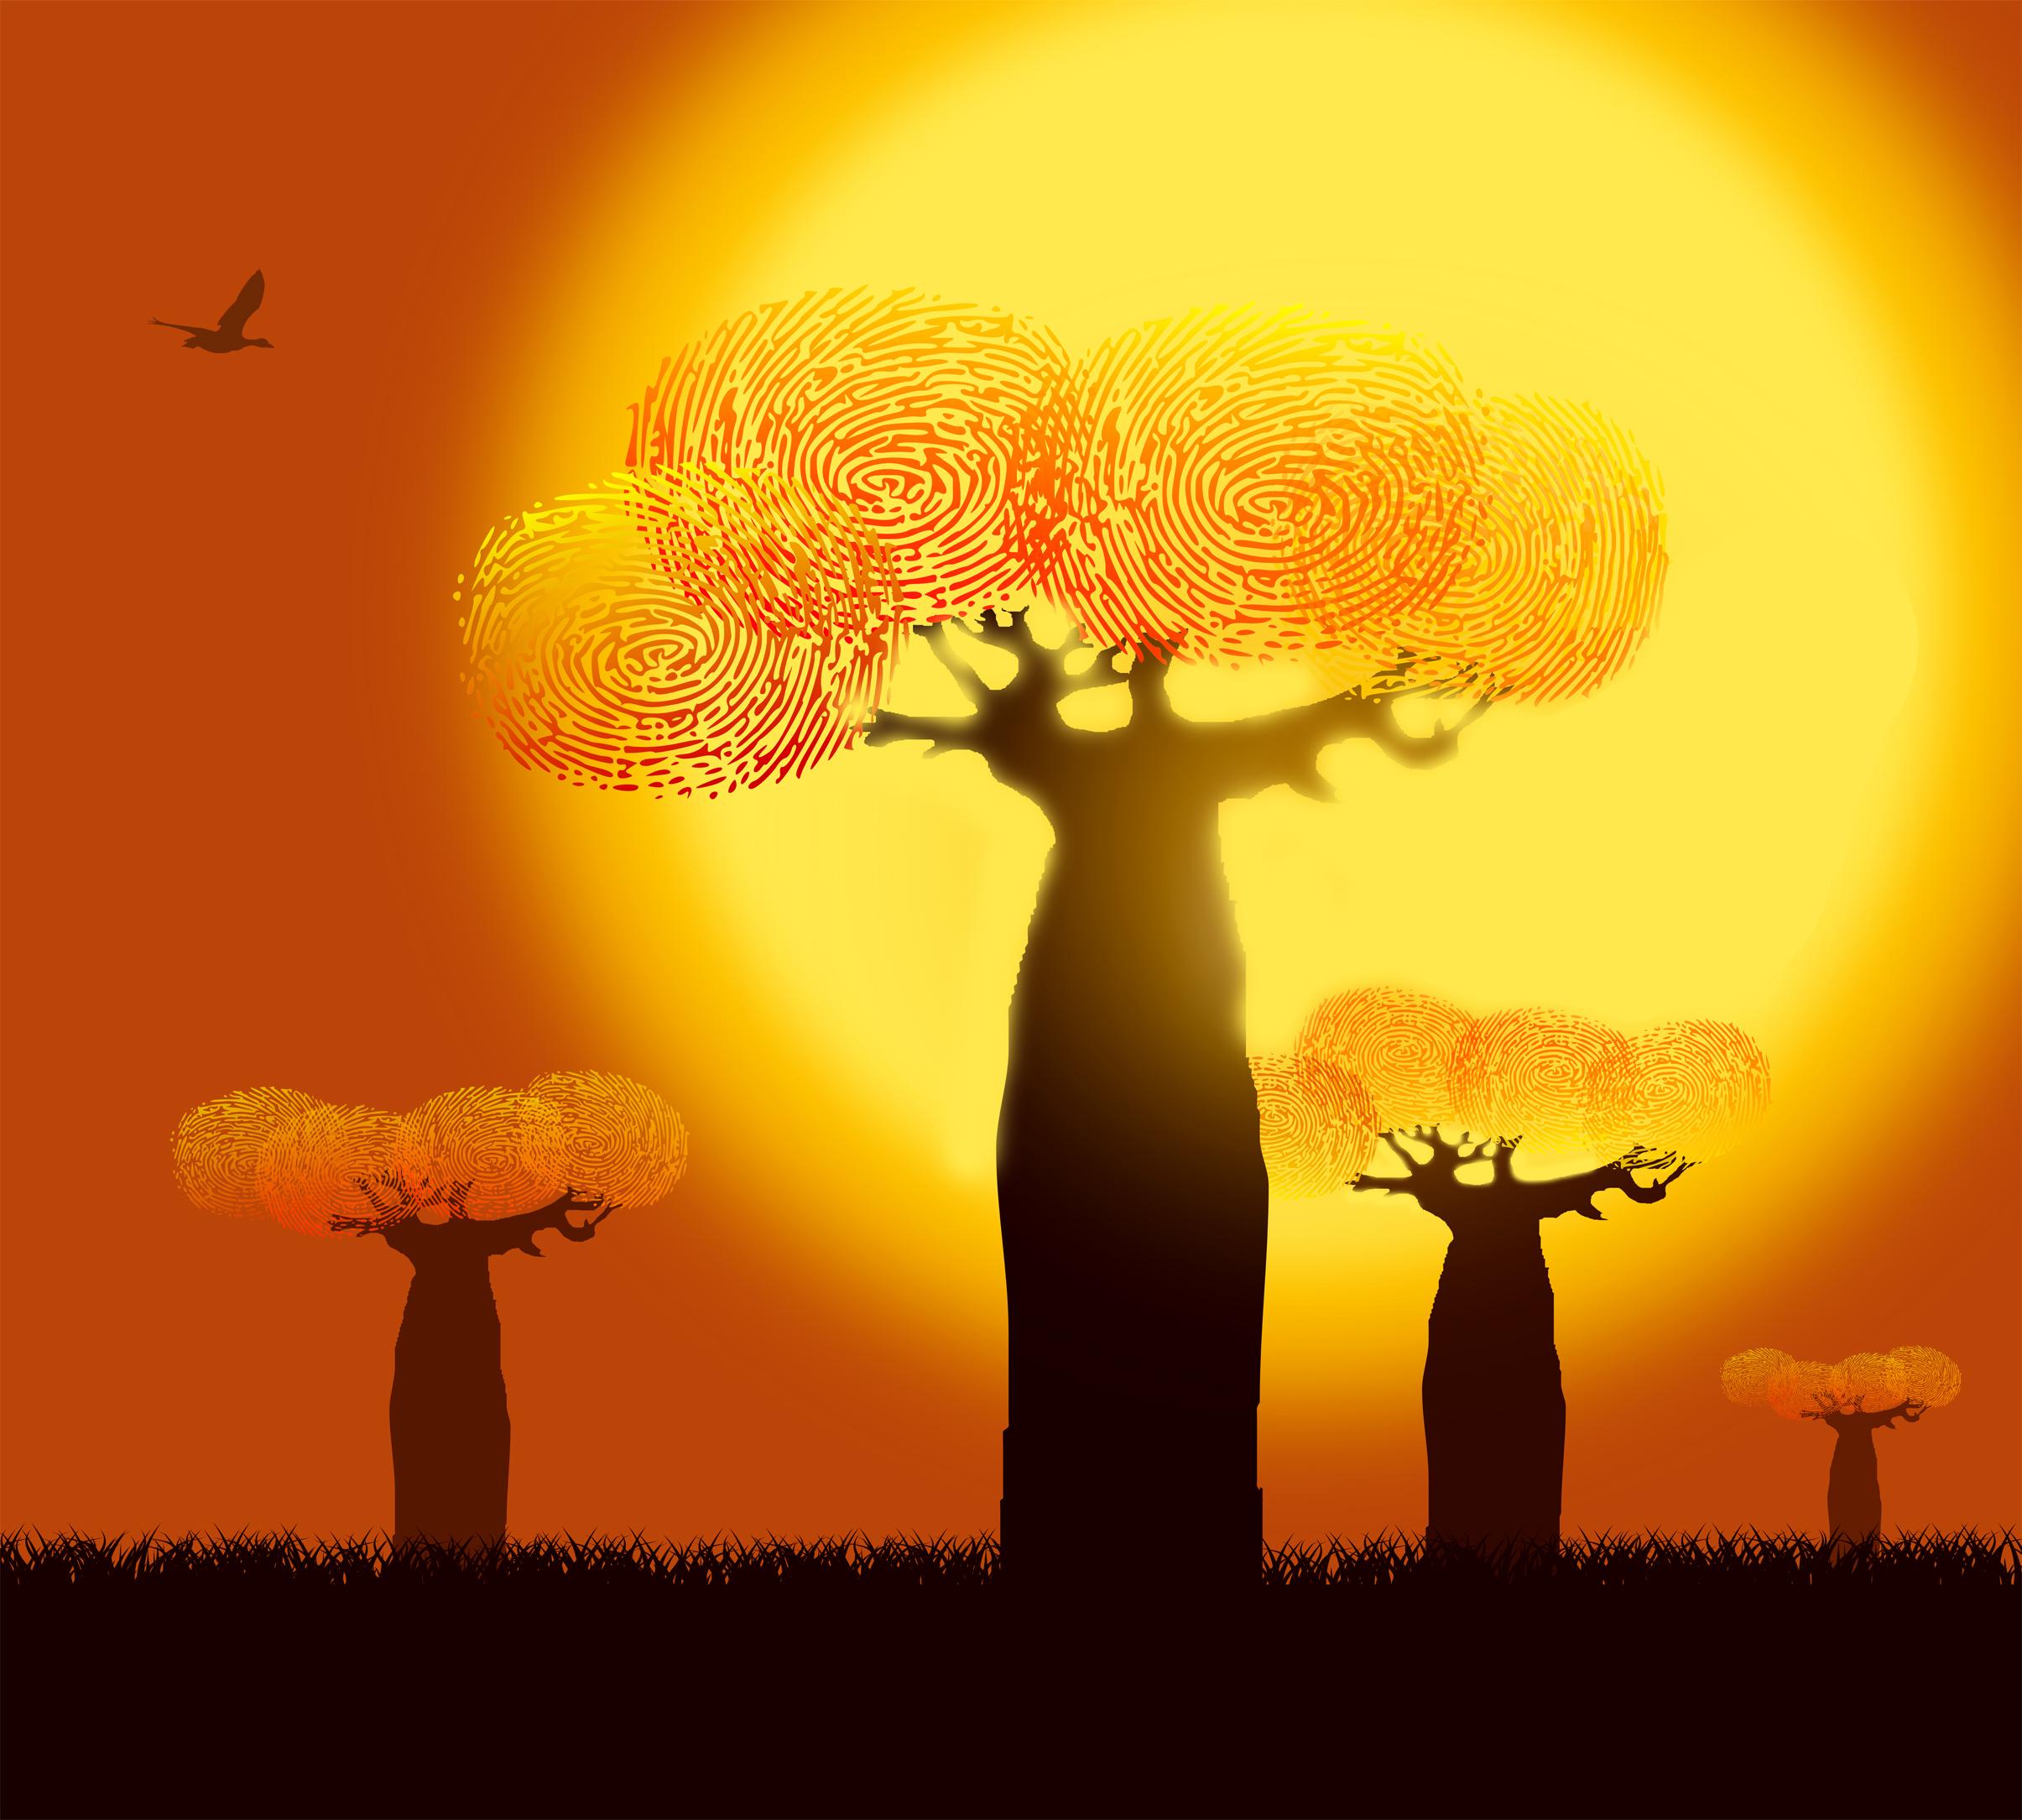 Fingerprints on baobab trees photo